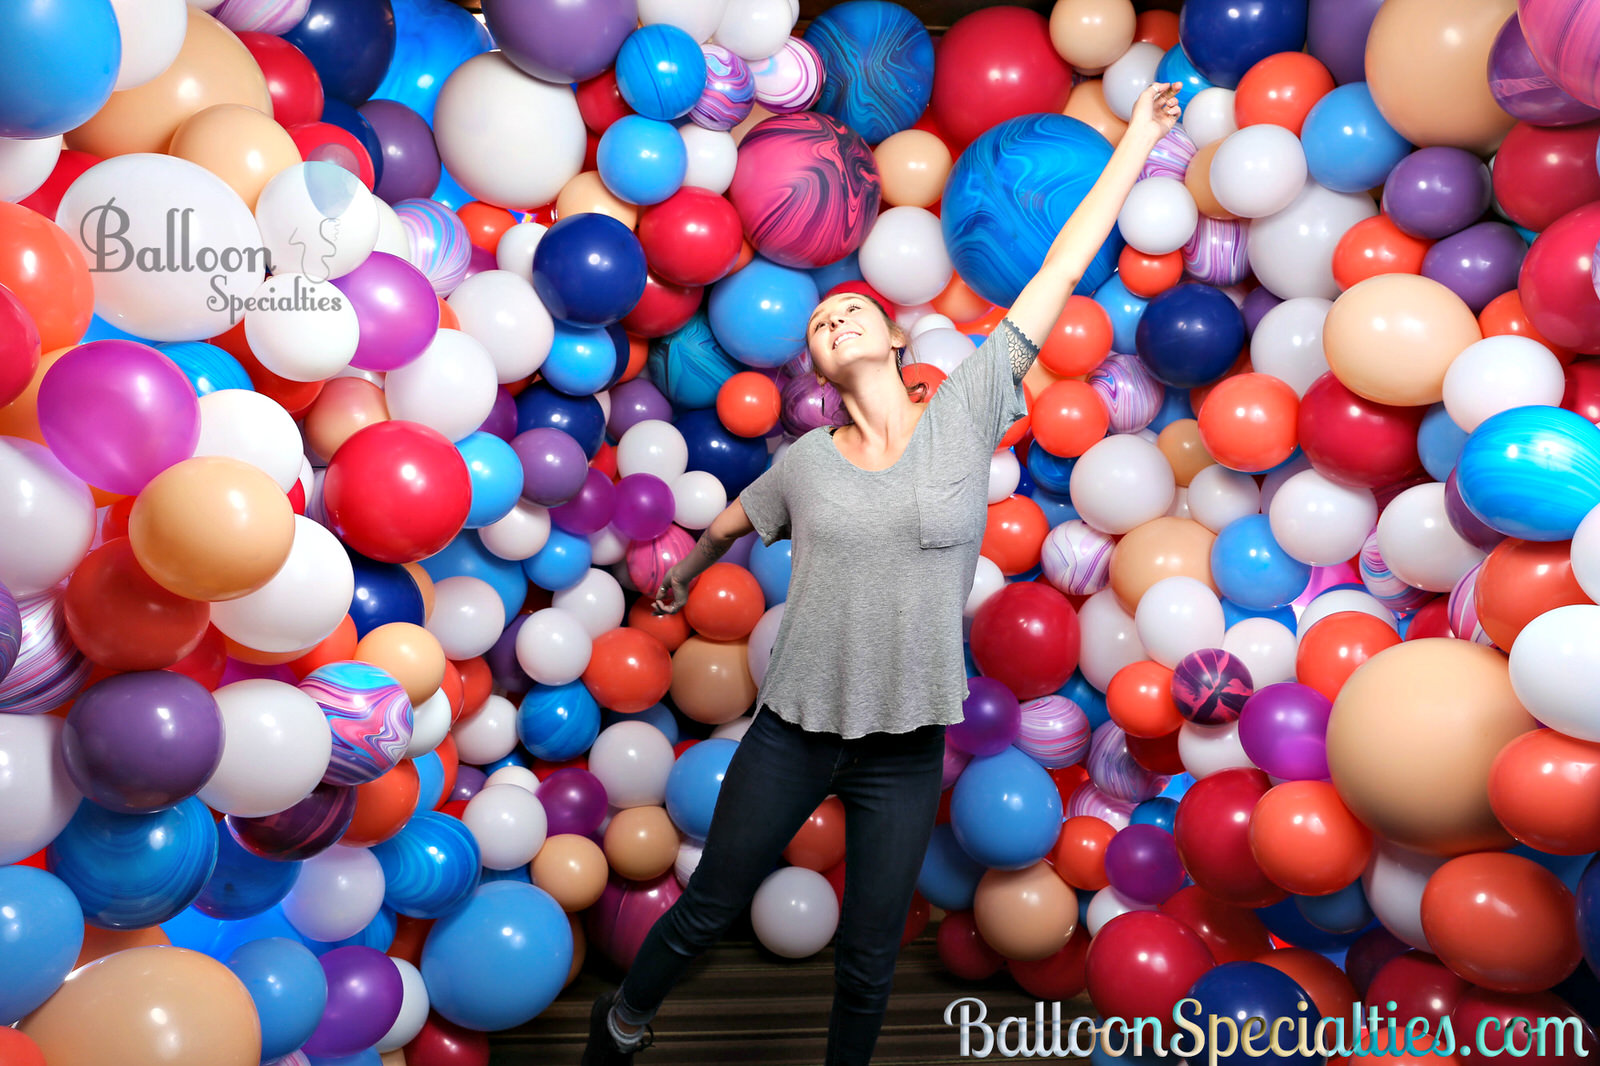 Branded Zim Balloon Specialties San Francisco Balloon Wall photobooth 180 degrees.jpg